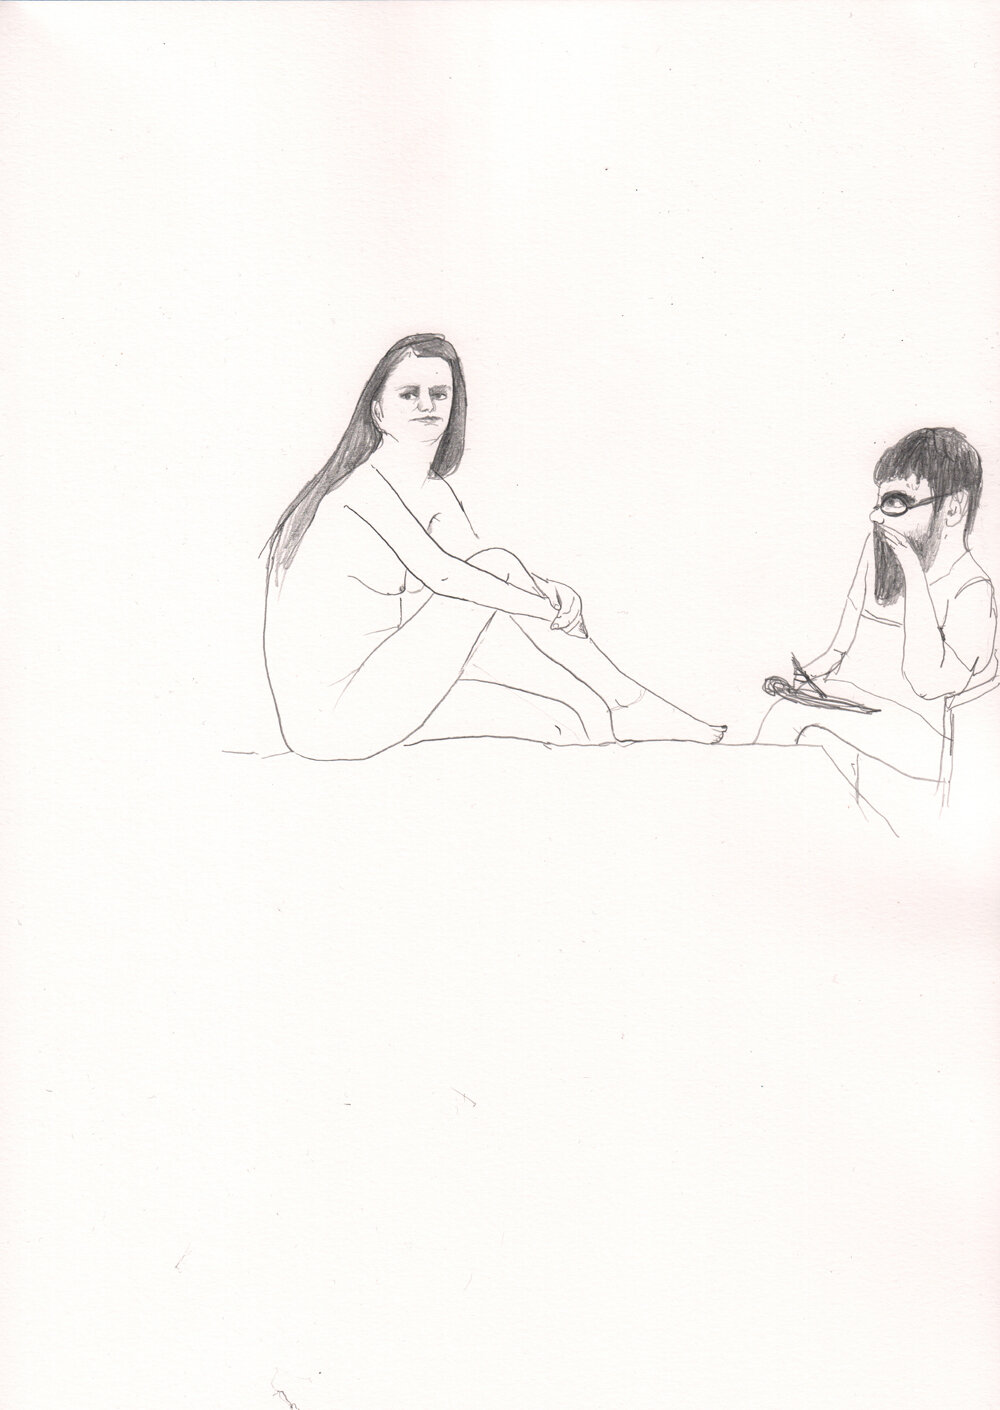 Man Drawing a Woman